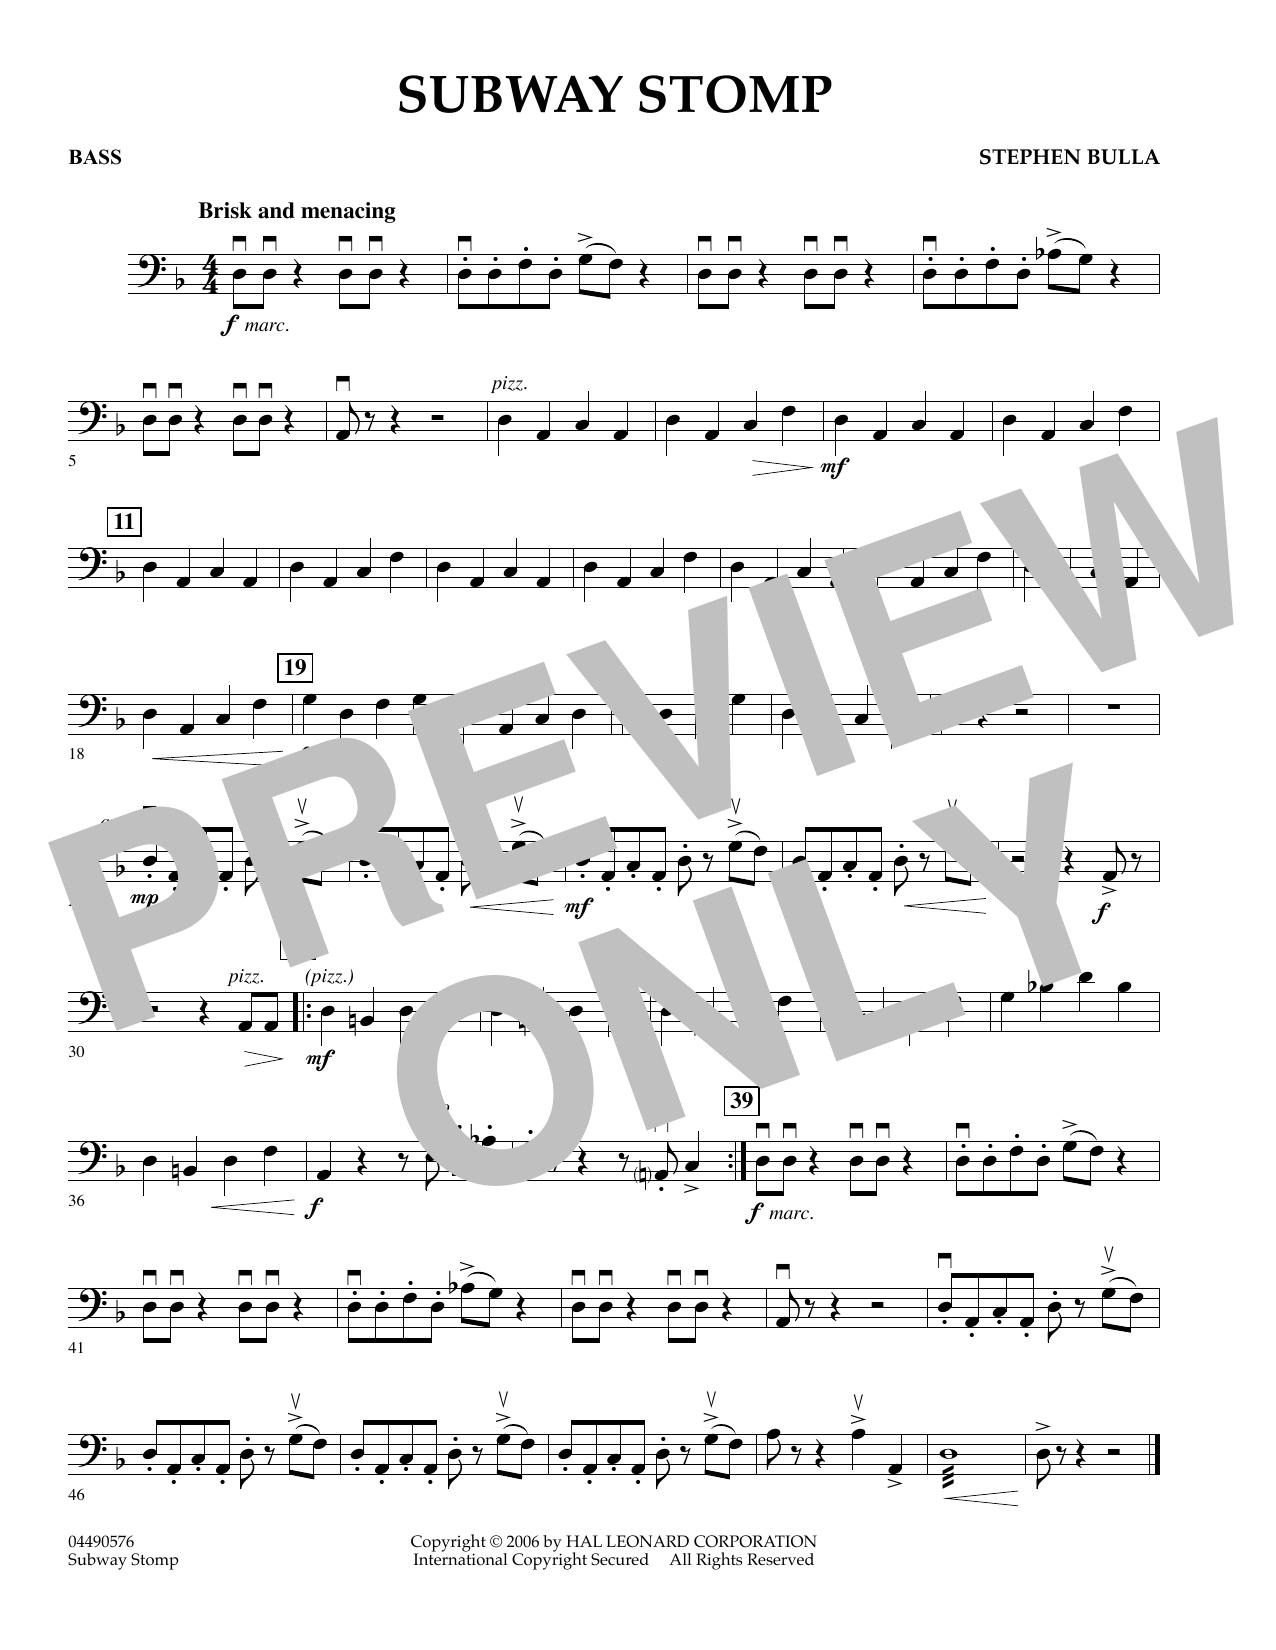 Subway Stomp - Bass (Orchestra)